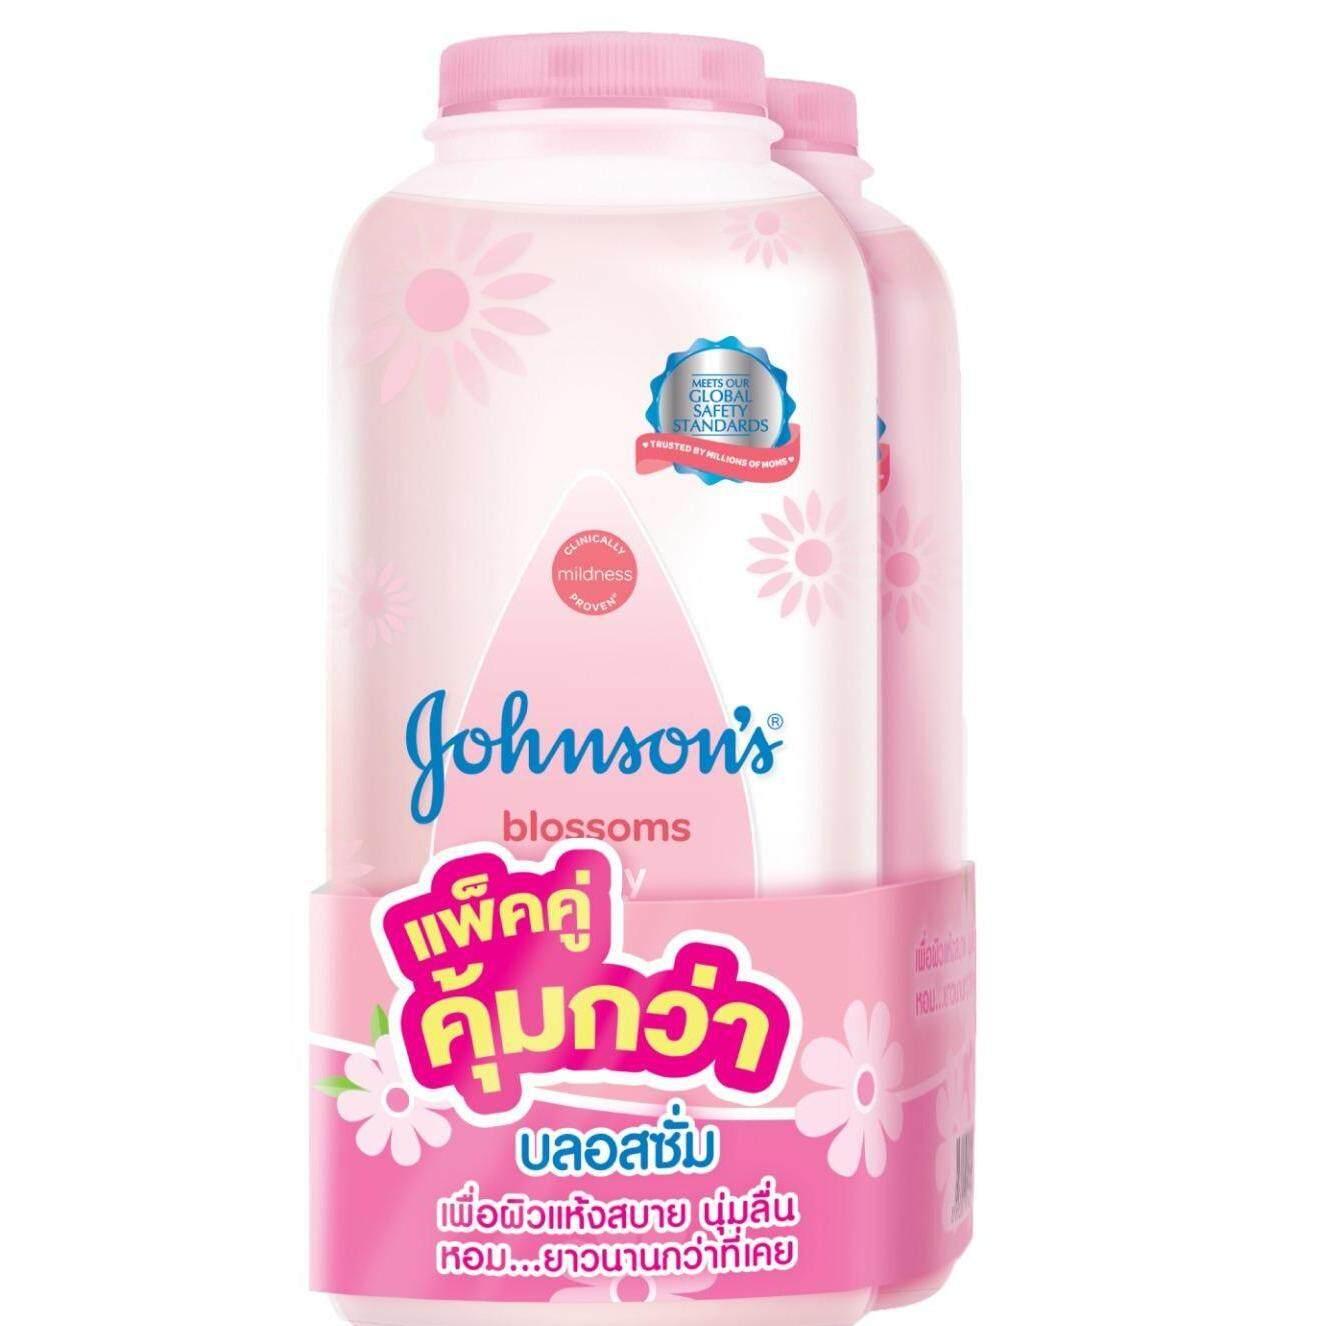 Johnsons Baby Powder Blossoms 180 G. Twinpack จอห์นสัน เบบี้ แป้งเด็ก บลอสซั่ม 180 ก. แพ็คคู่ Twin Pack 180 G By Johnson & Johnson Official Store.